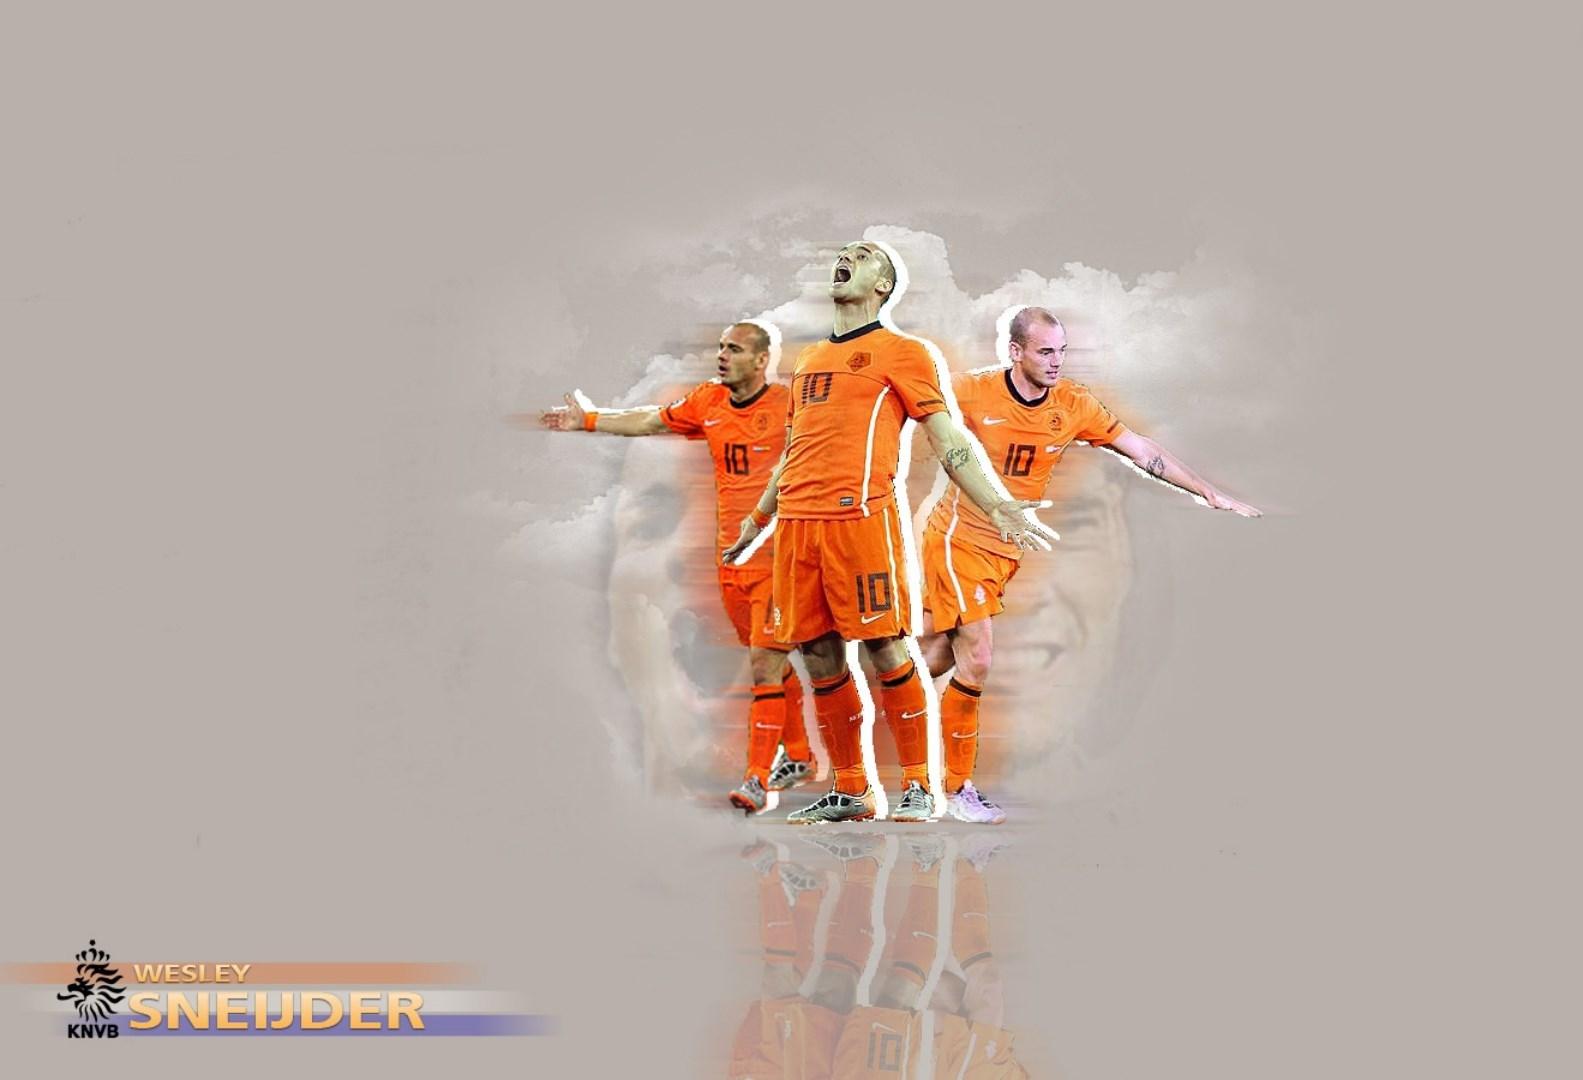 wesley+sneijder+galatasaray+resimleri+rooteto+17 Wesley Sneijder Galatasaray HD Resimleri